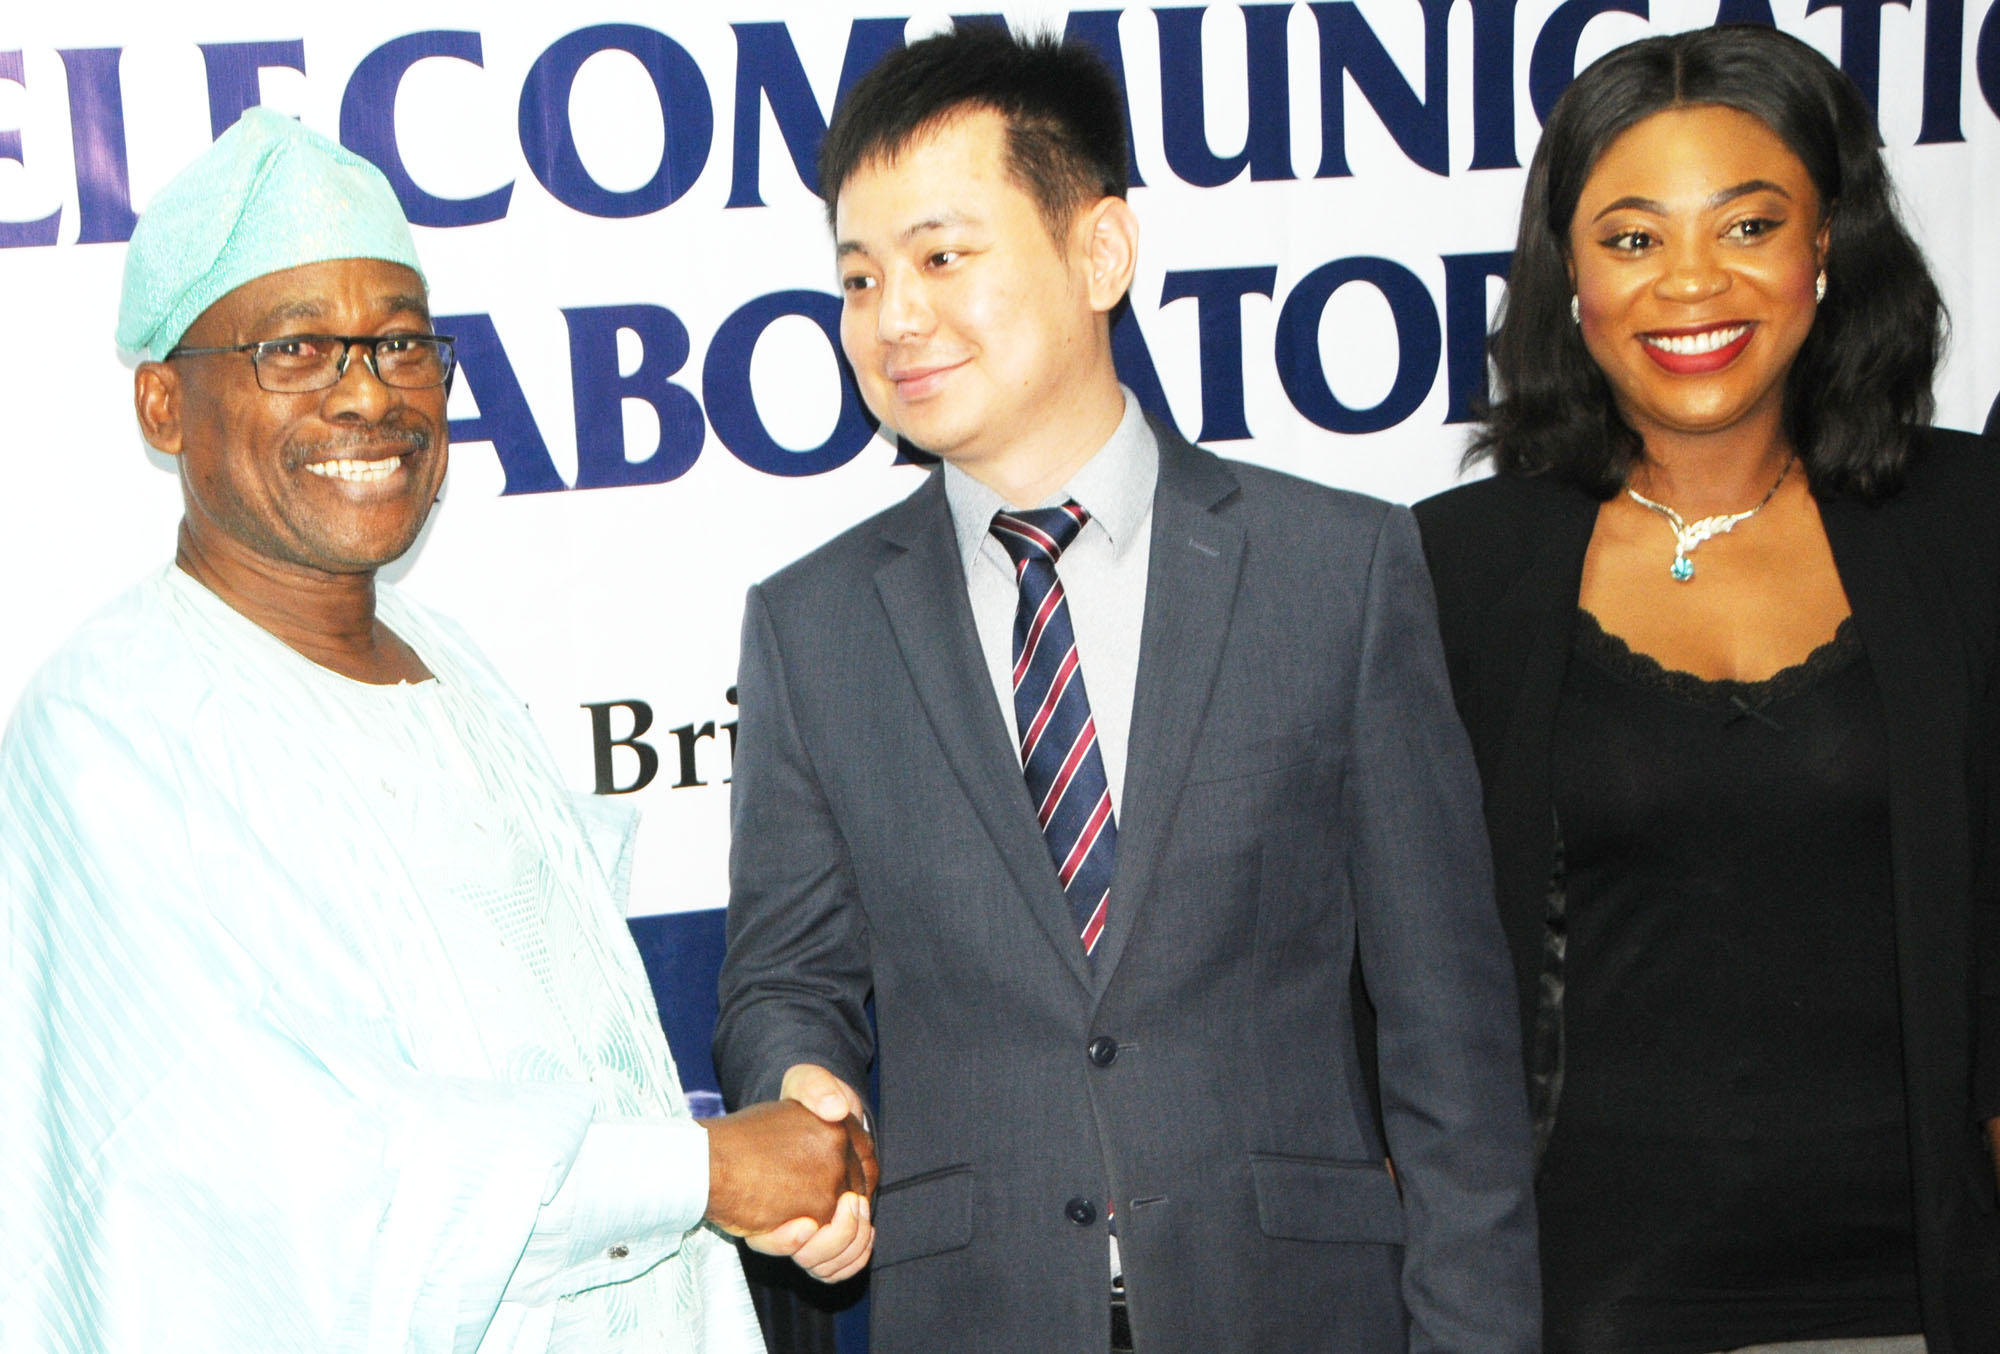 Huawei Technologies Company Nigeria Ltd. donates million dollar telecommunications laboratory to Nigeria